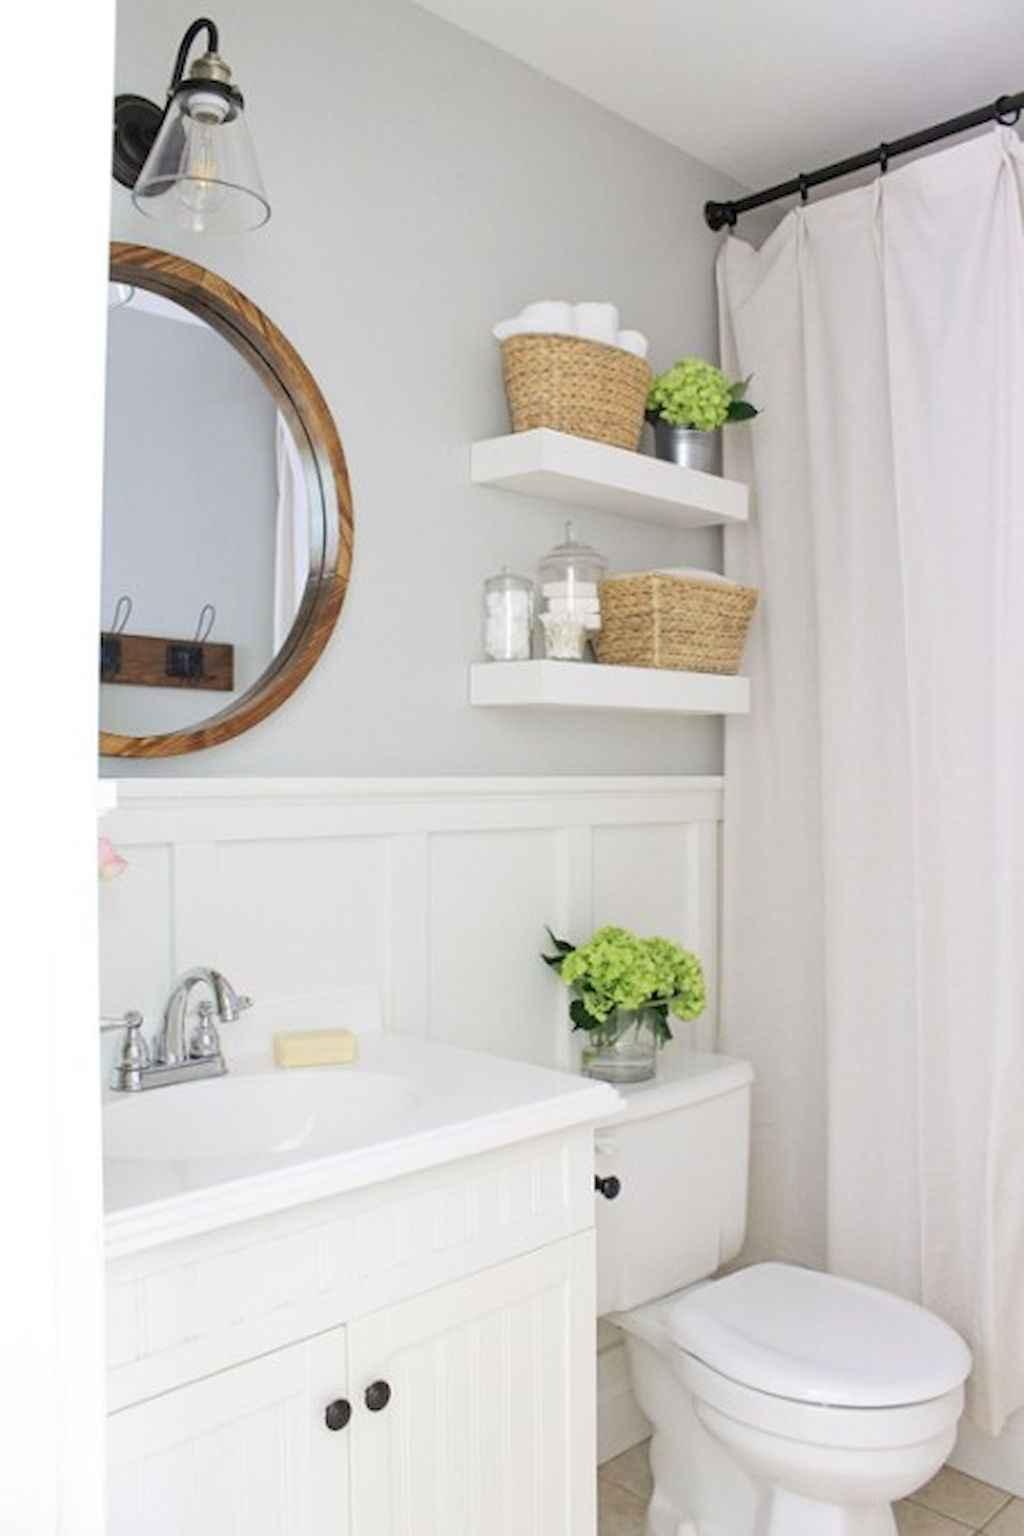 Inspiring apartment bathroom remodel ideas on a budget (7)